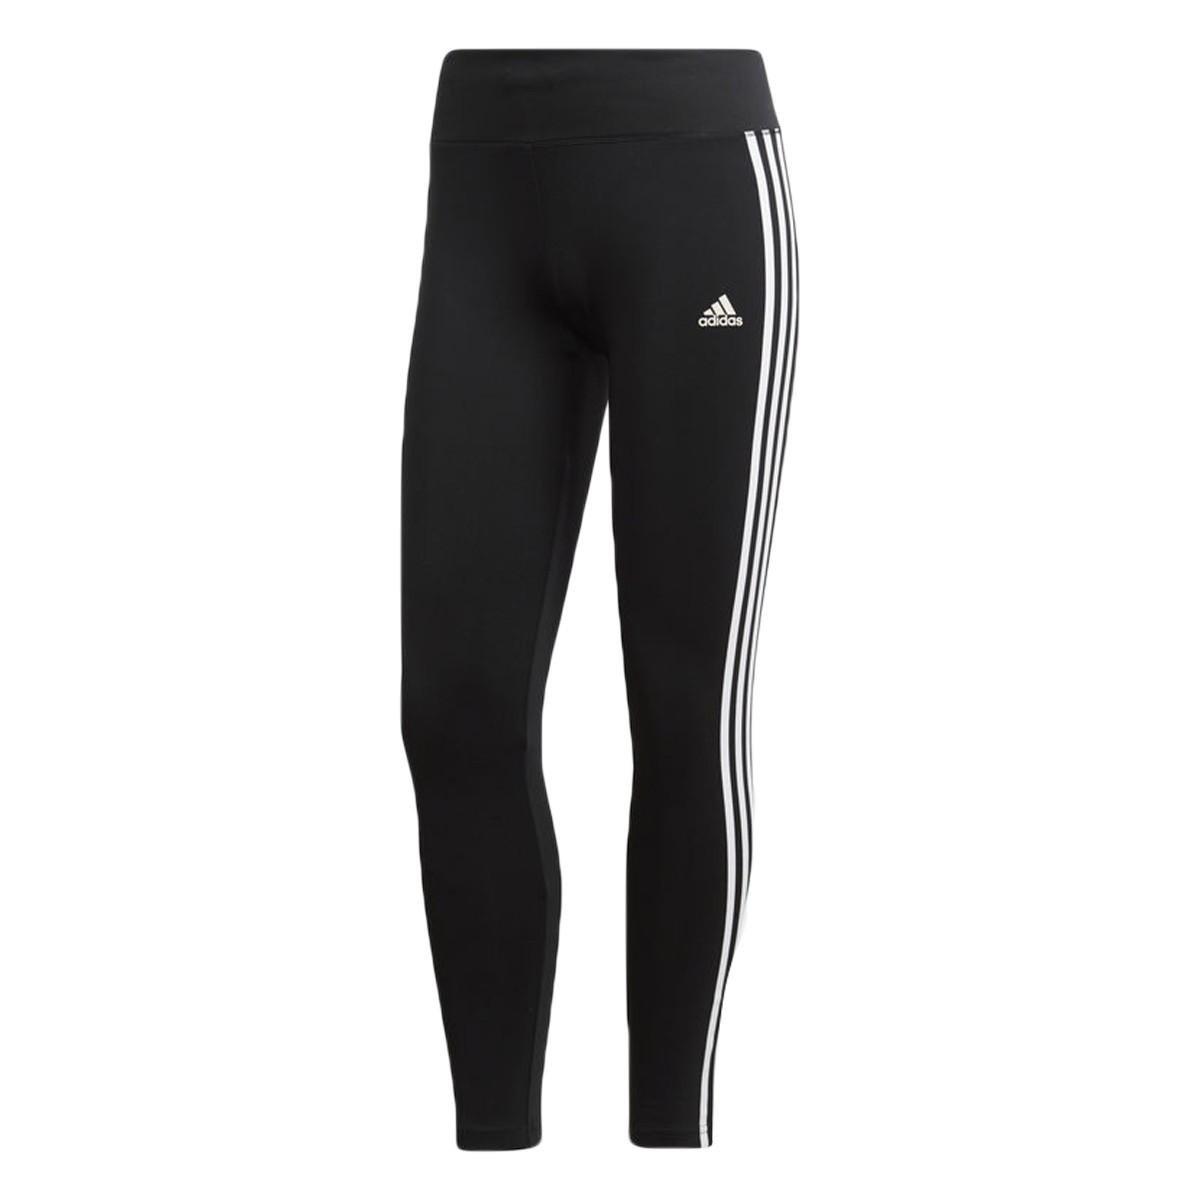 Designed Move 2 Legging Feminina Preto Branco e Calça Adidas IxqEBZH